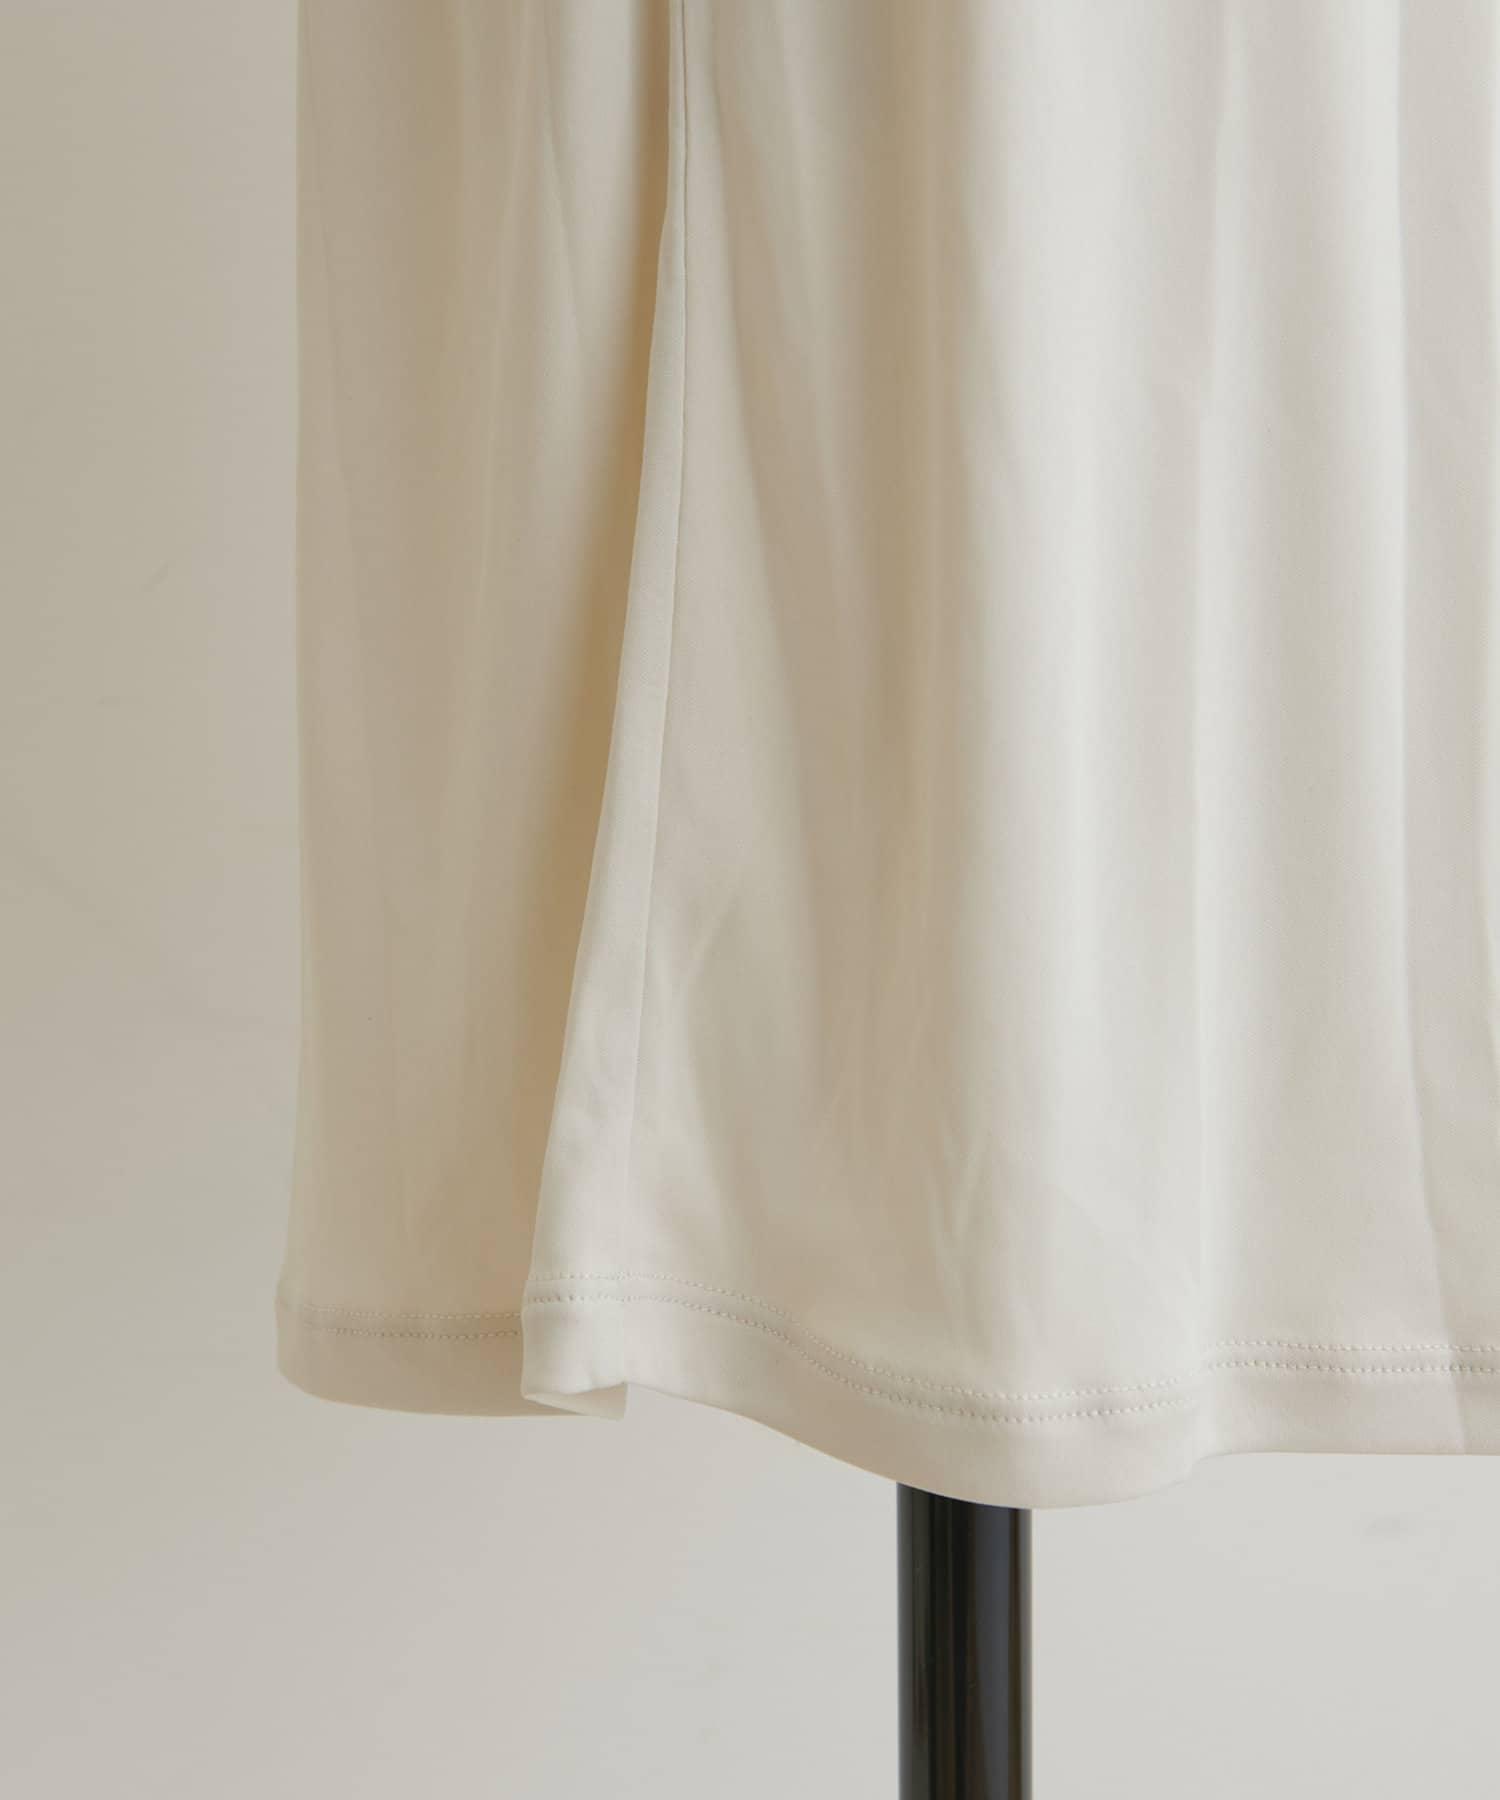 natural couture(ナチュラルクチュール) 巾着付きペチスカート